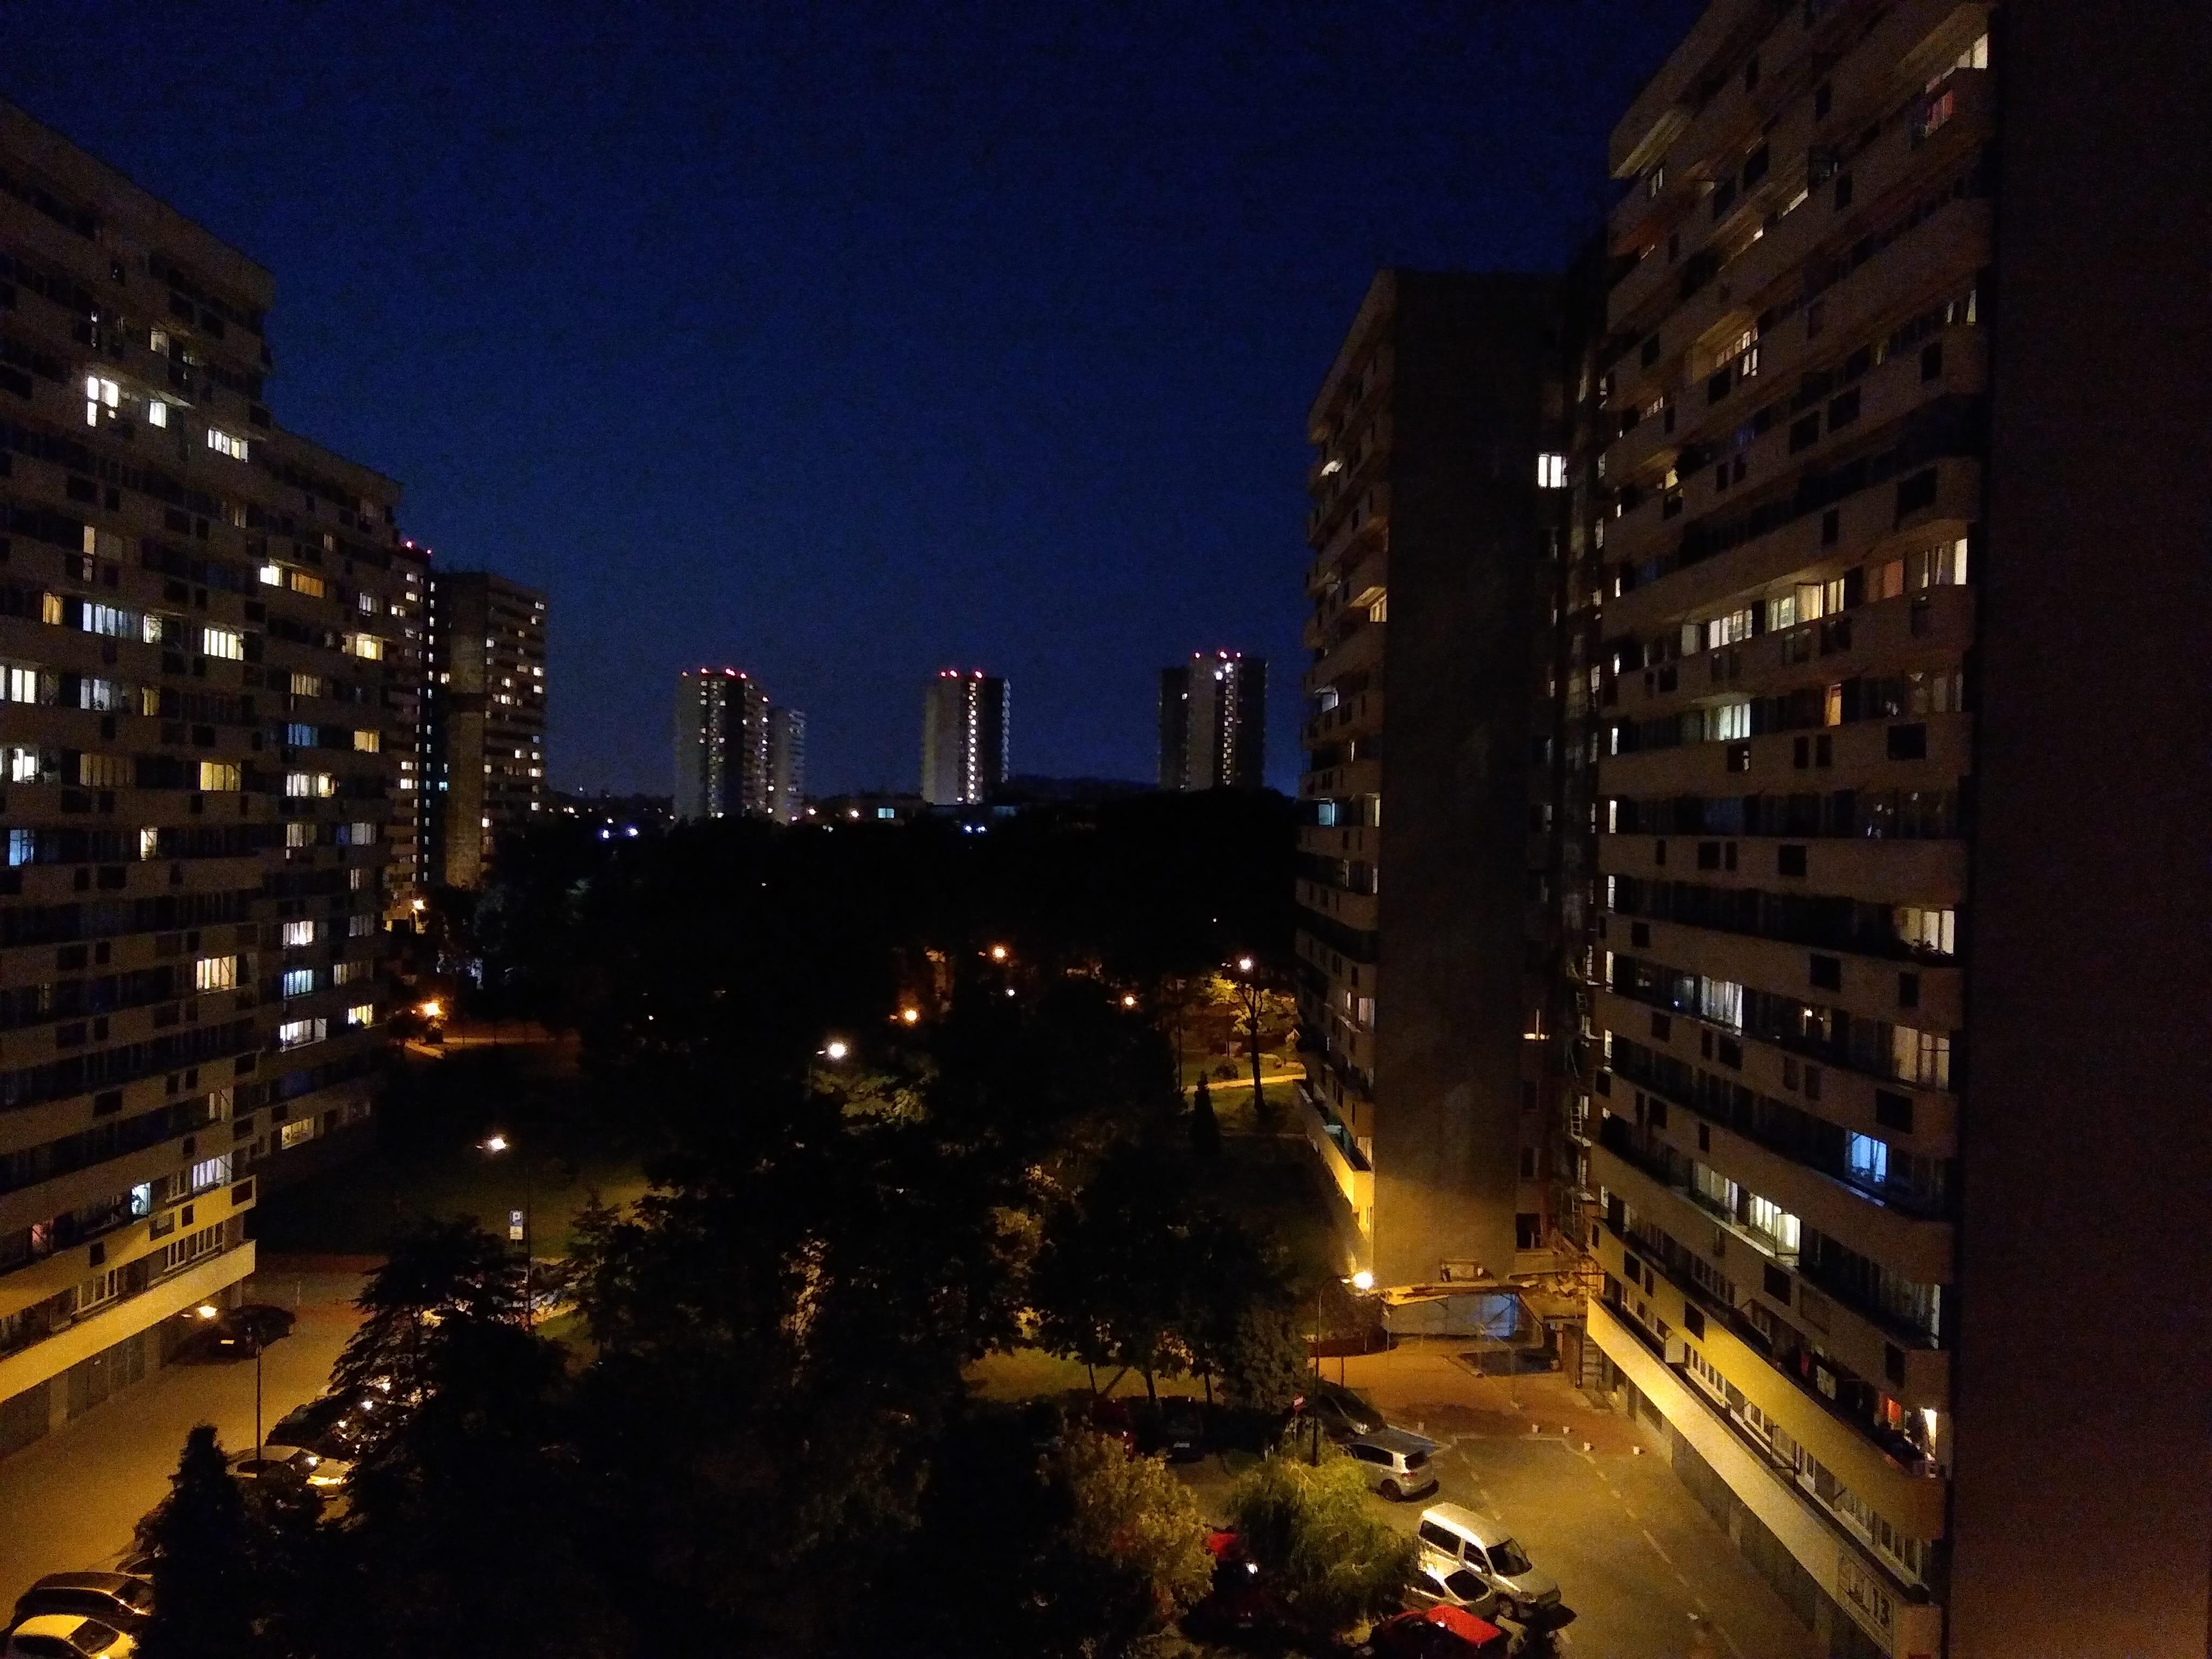 Zdjęcia nocne - Motorola Moto G6